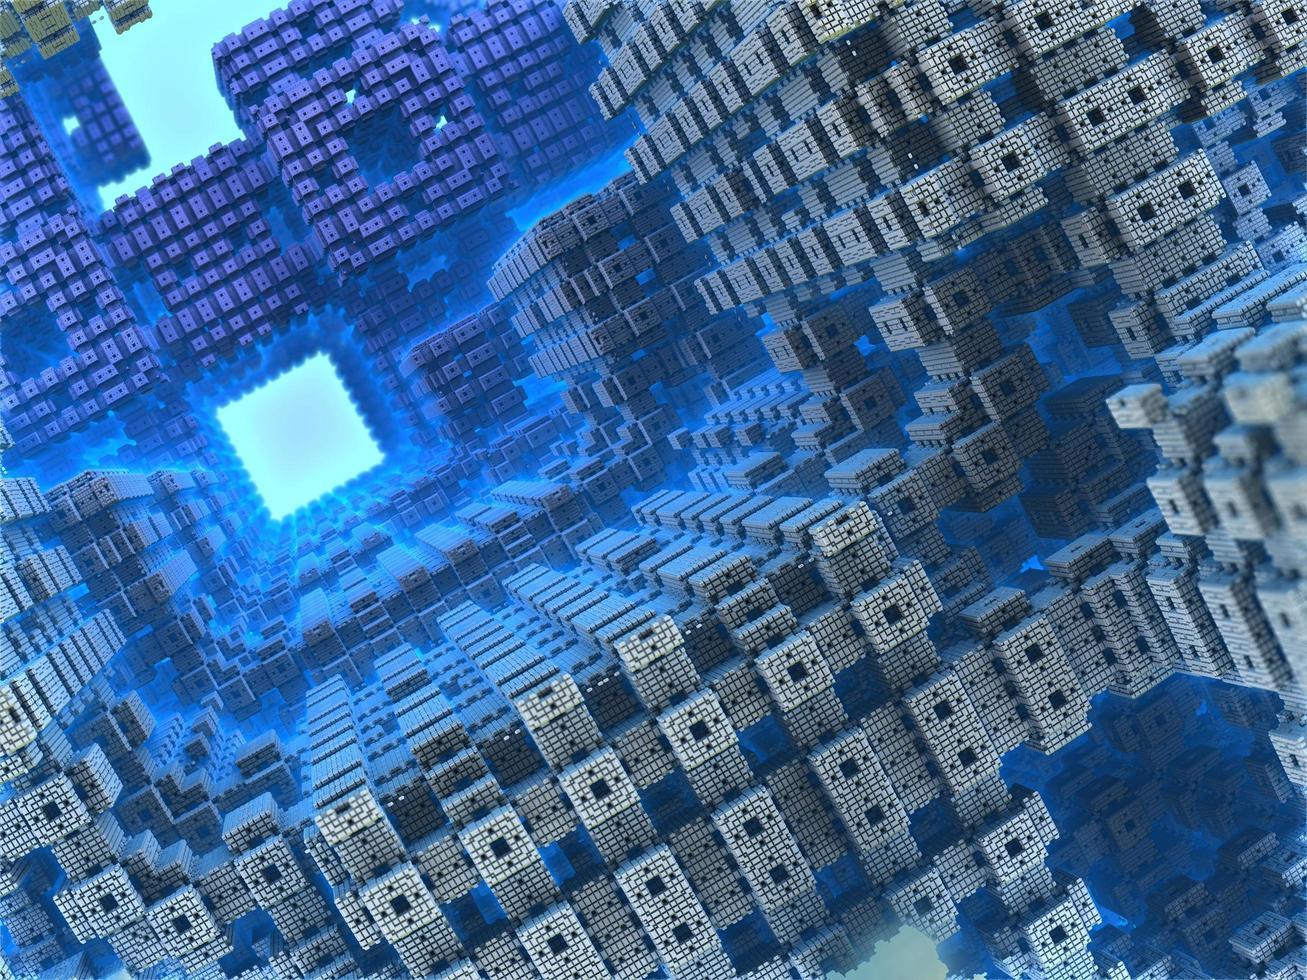 Blue geometric 3d render photo